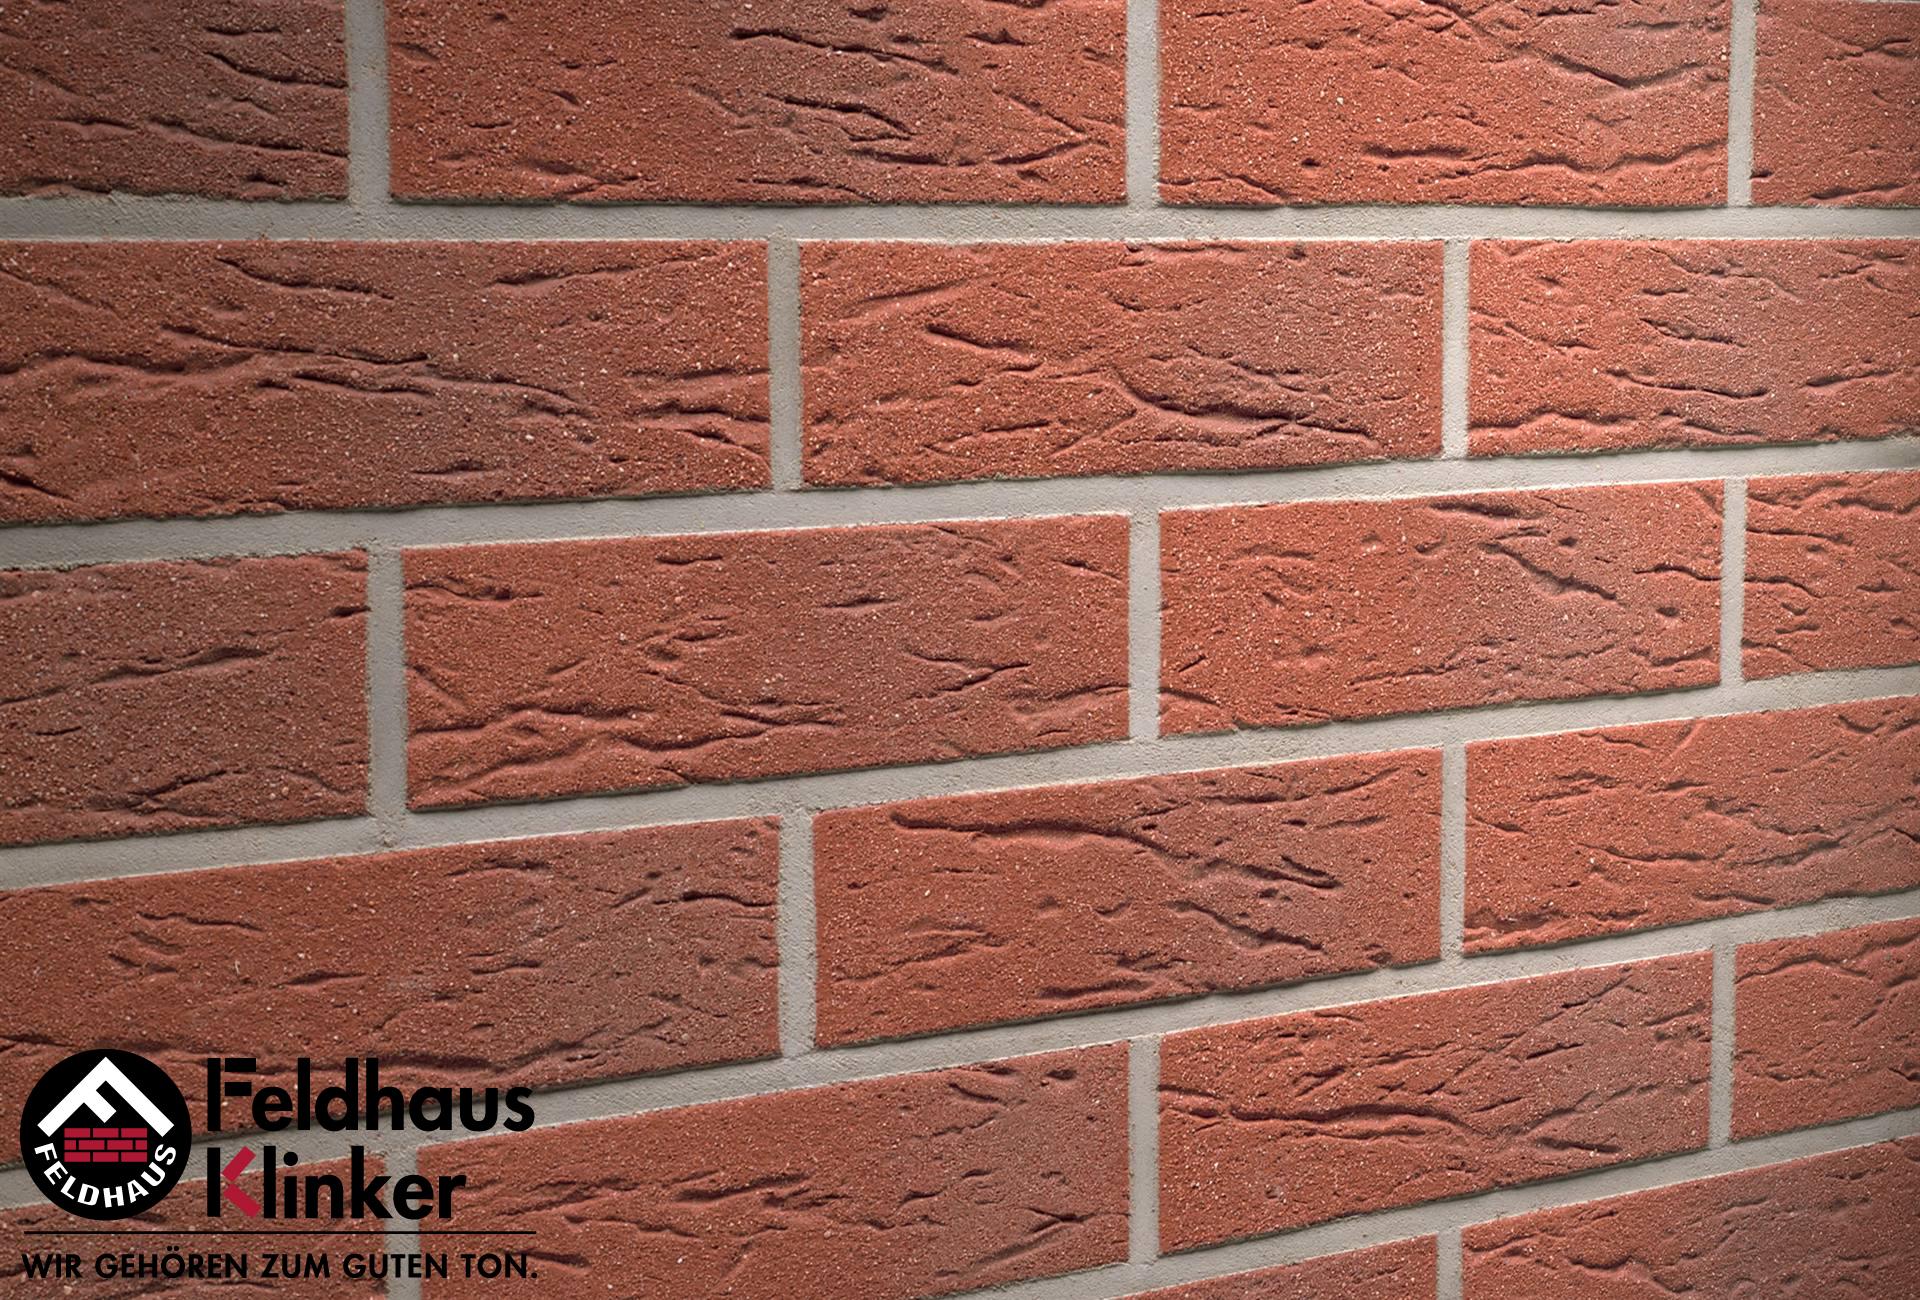 R335 Feldhaus Klinker клинкерная плитка 1